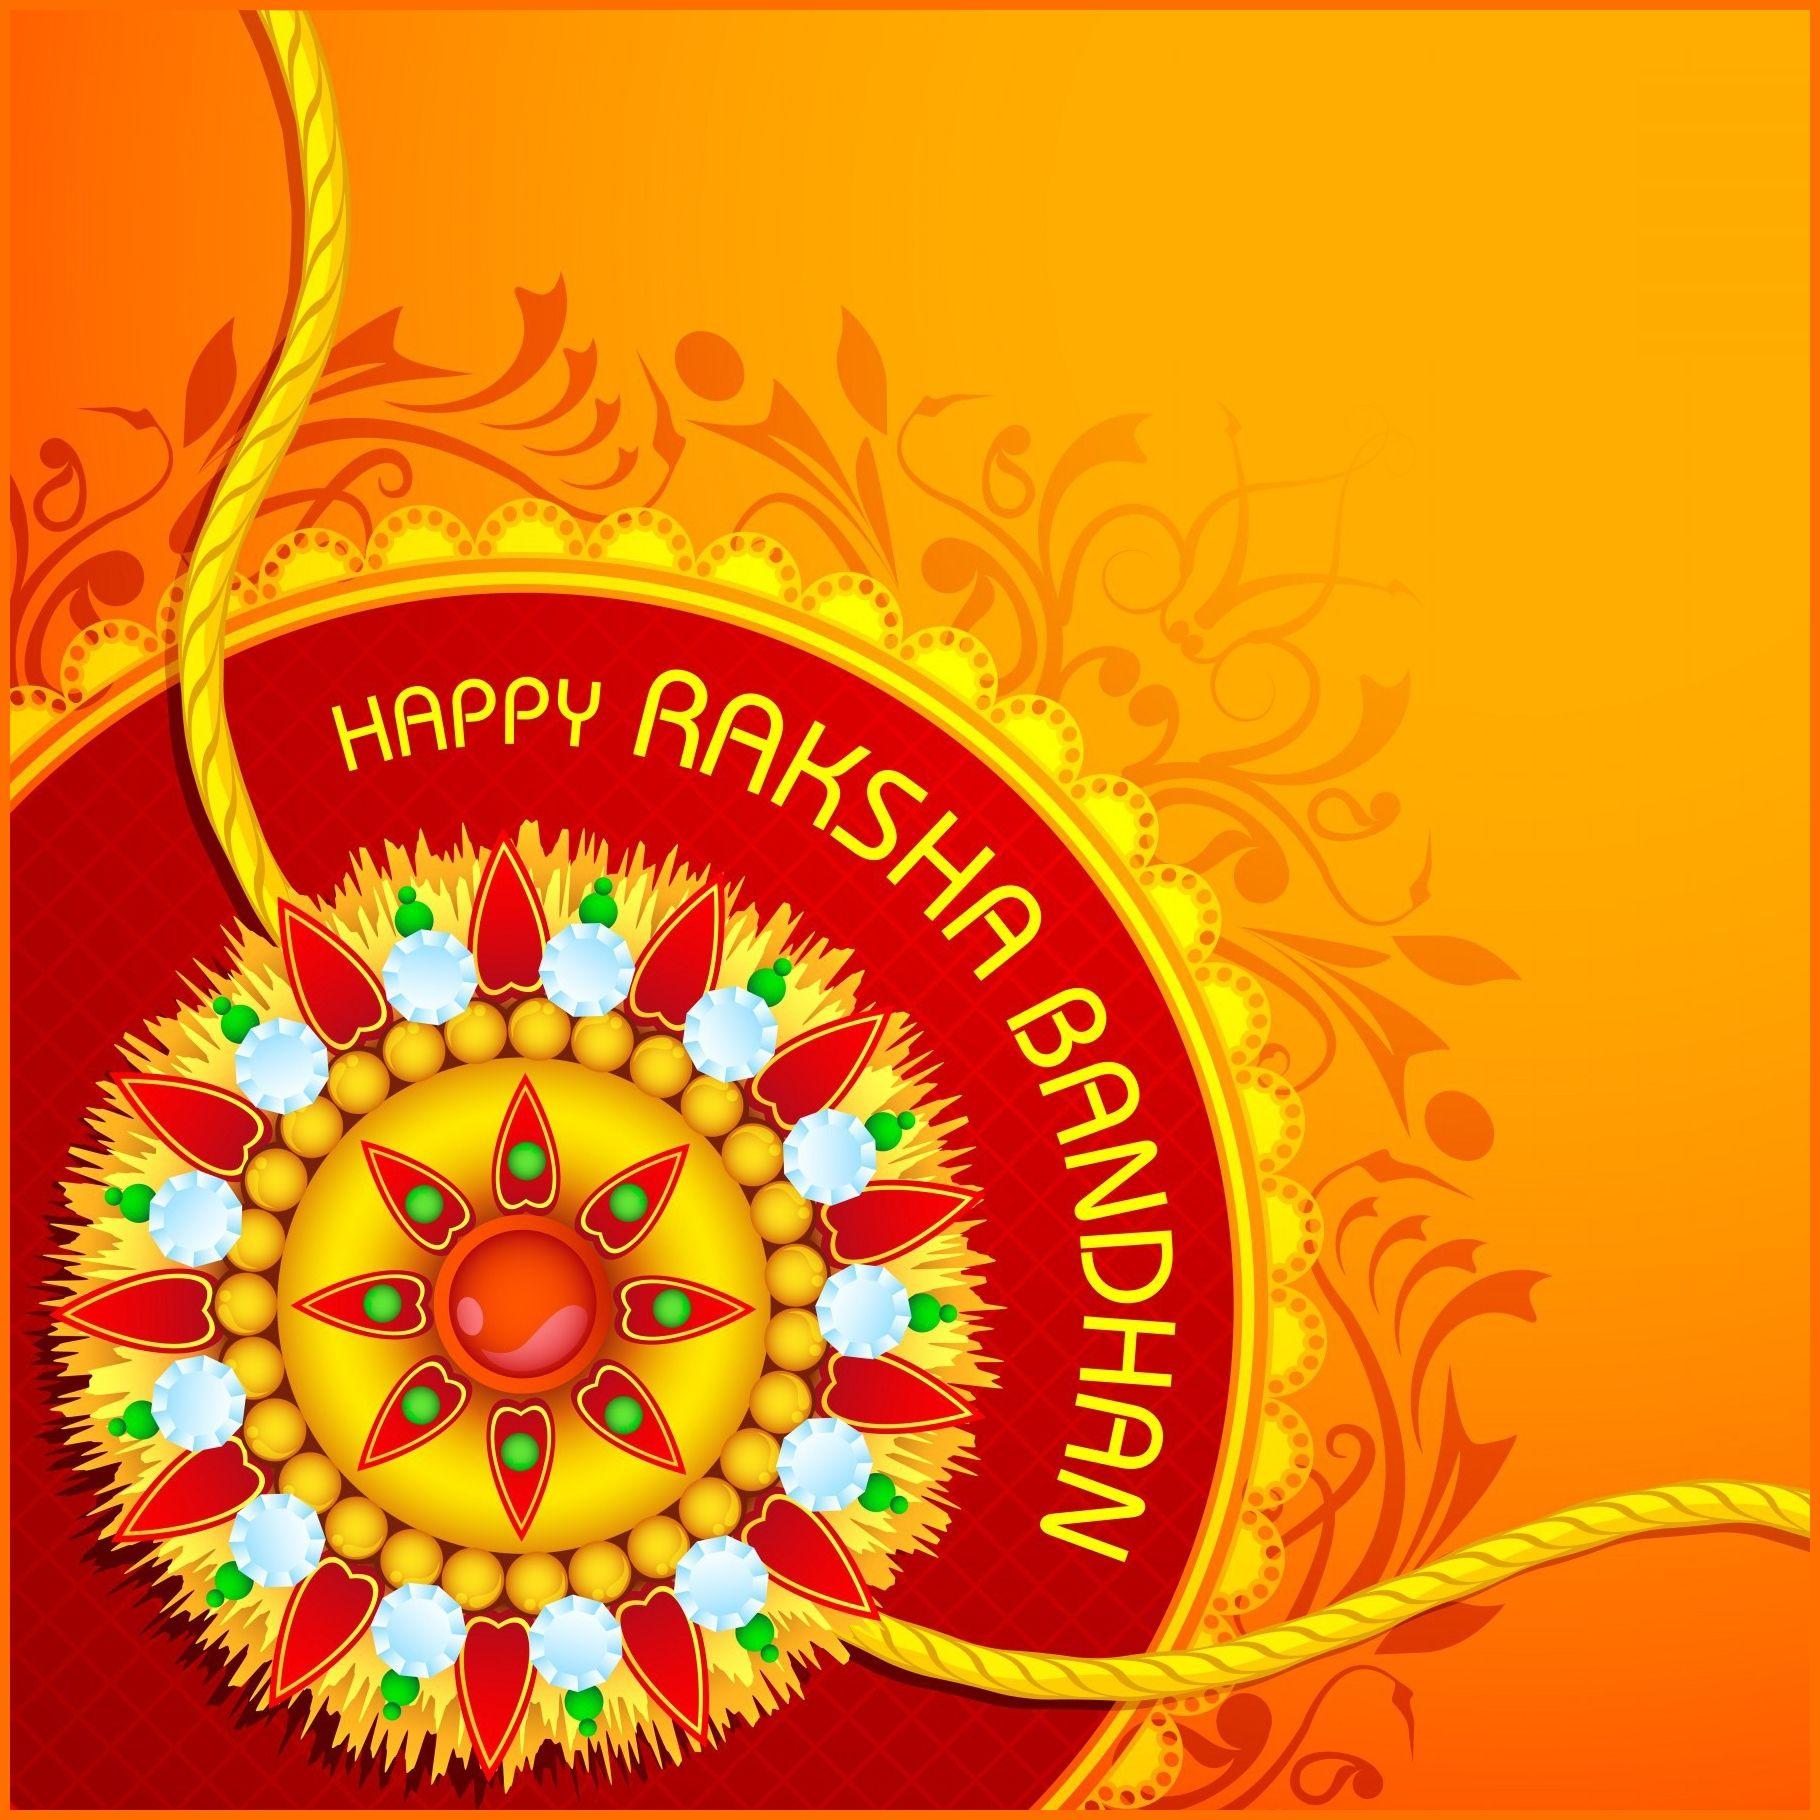 Happy Raksha Bandhan Rakhi August 26 2018 Hd Images